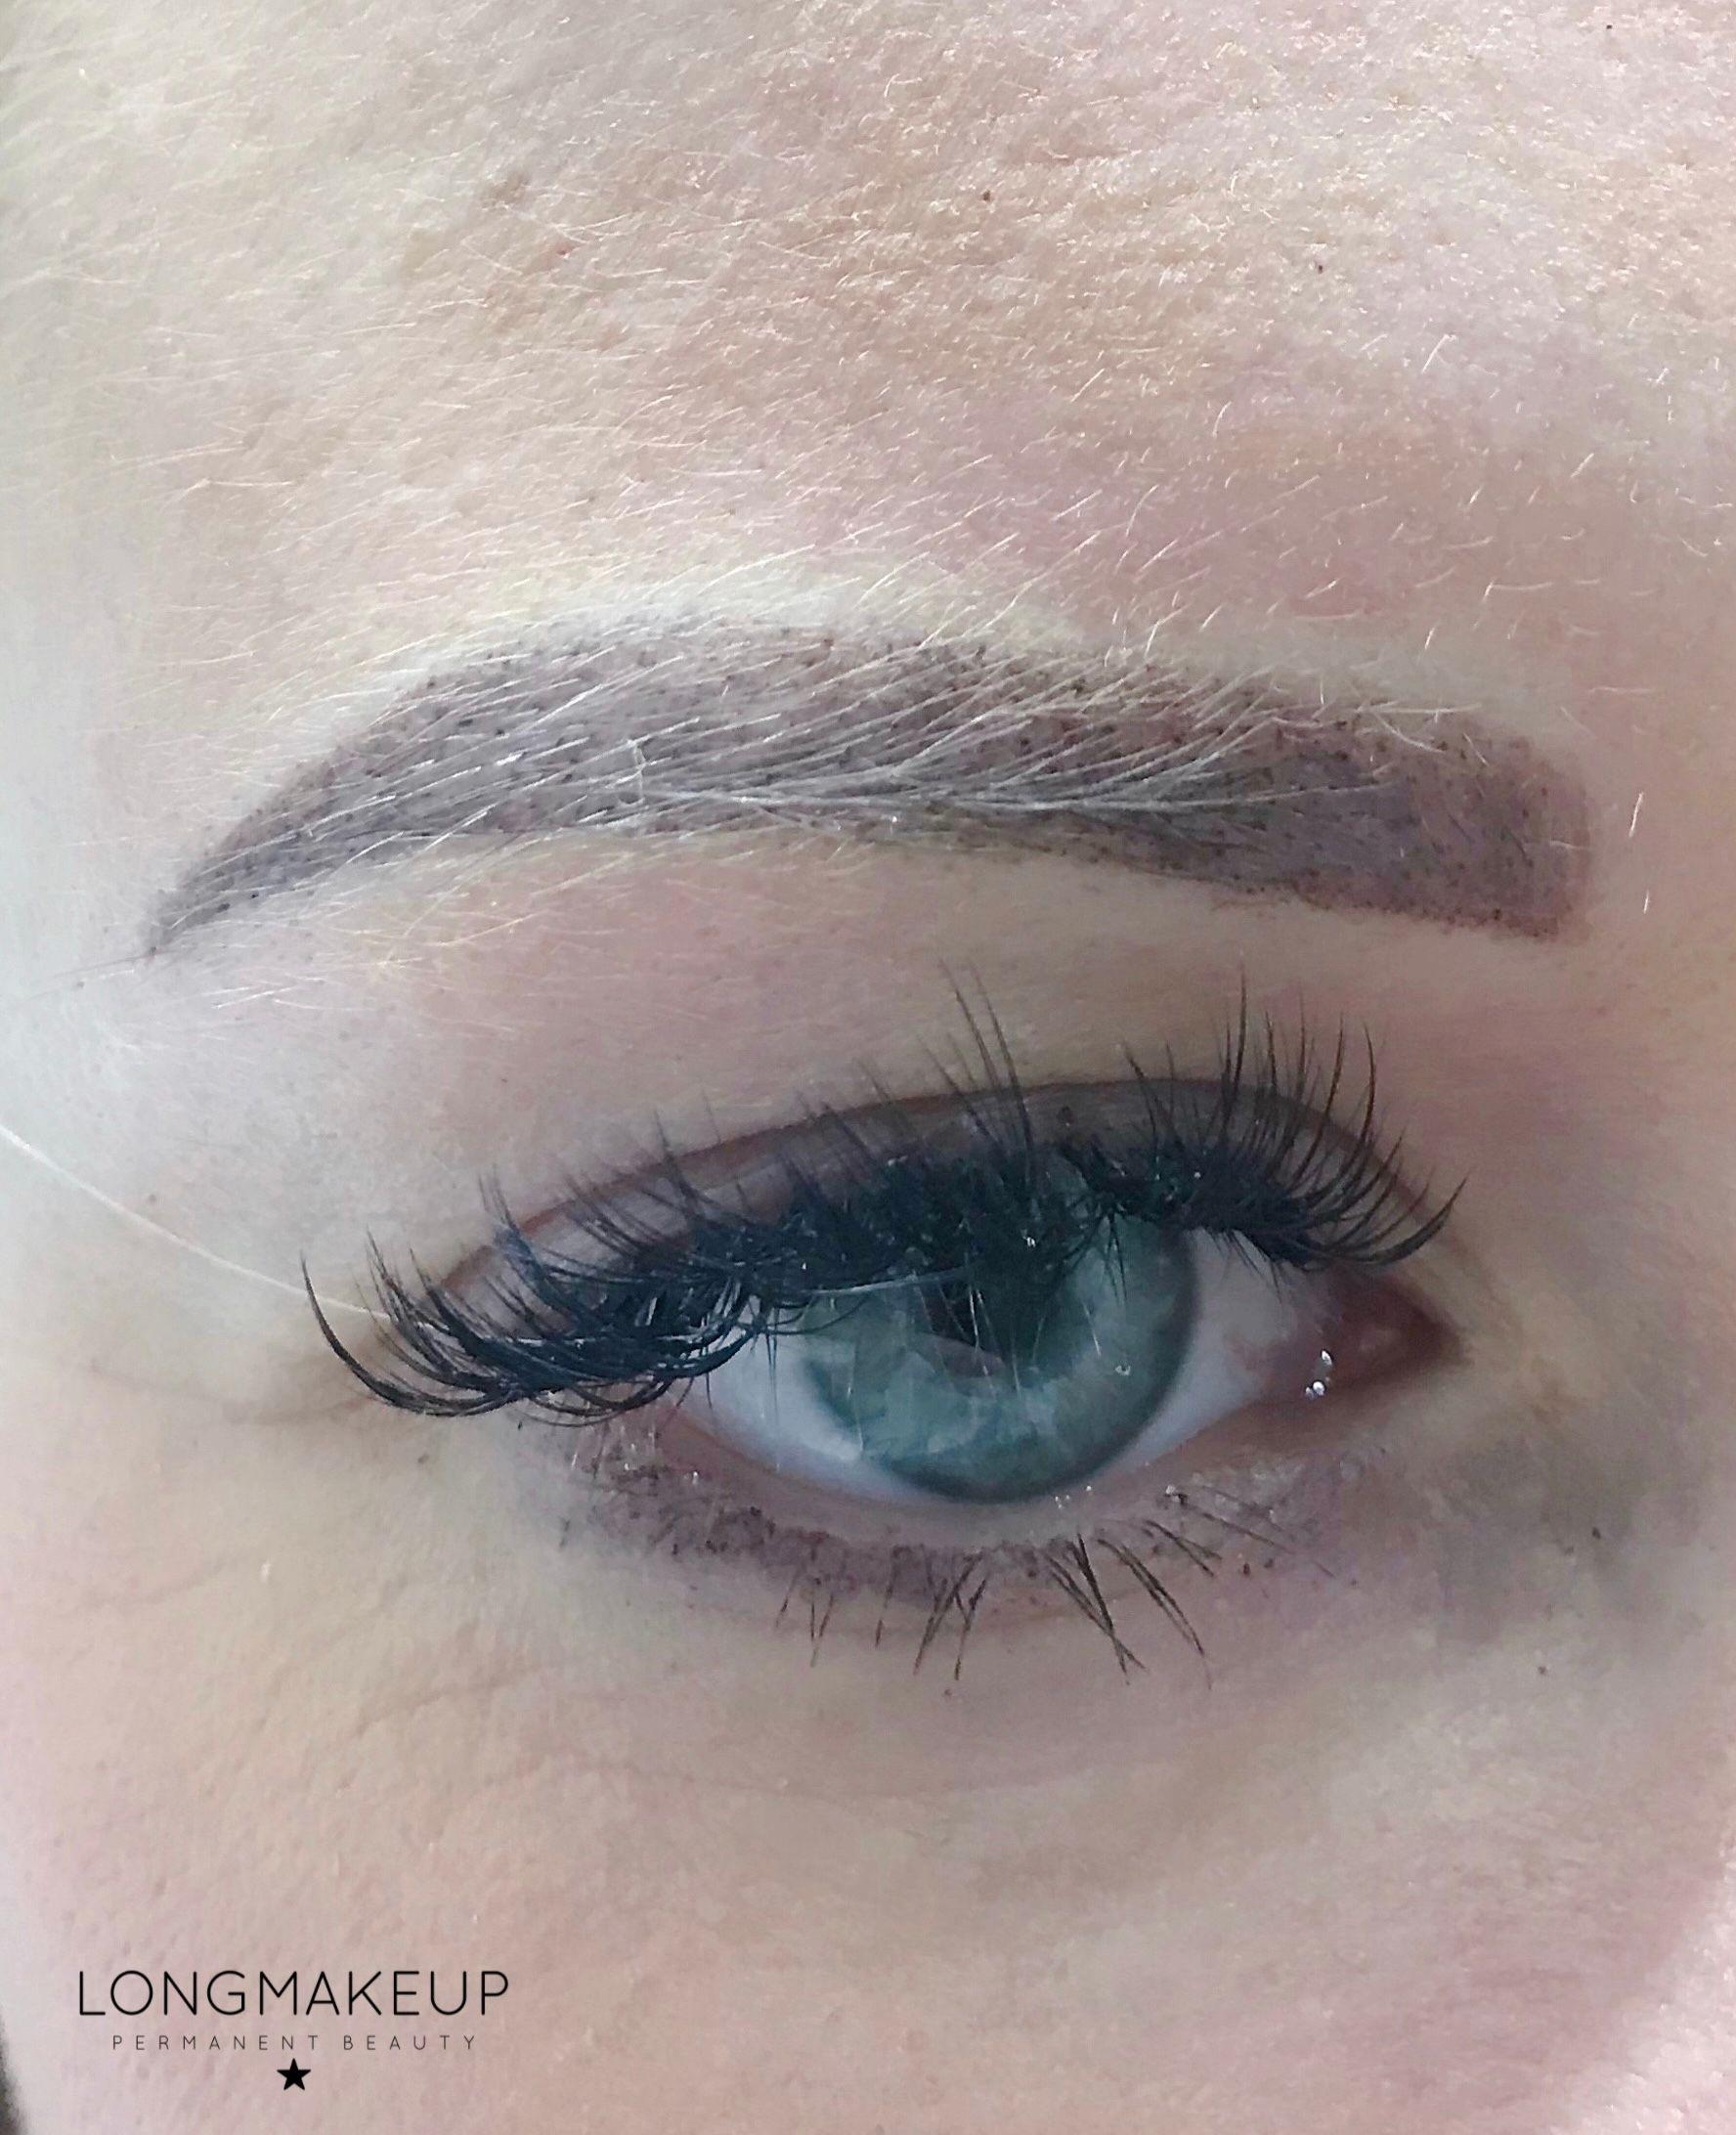 Powder eyebrow shading